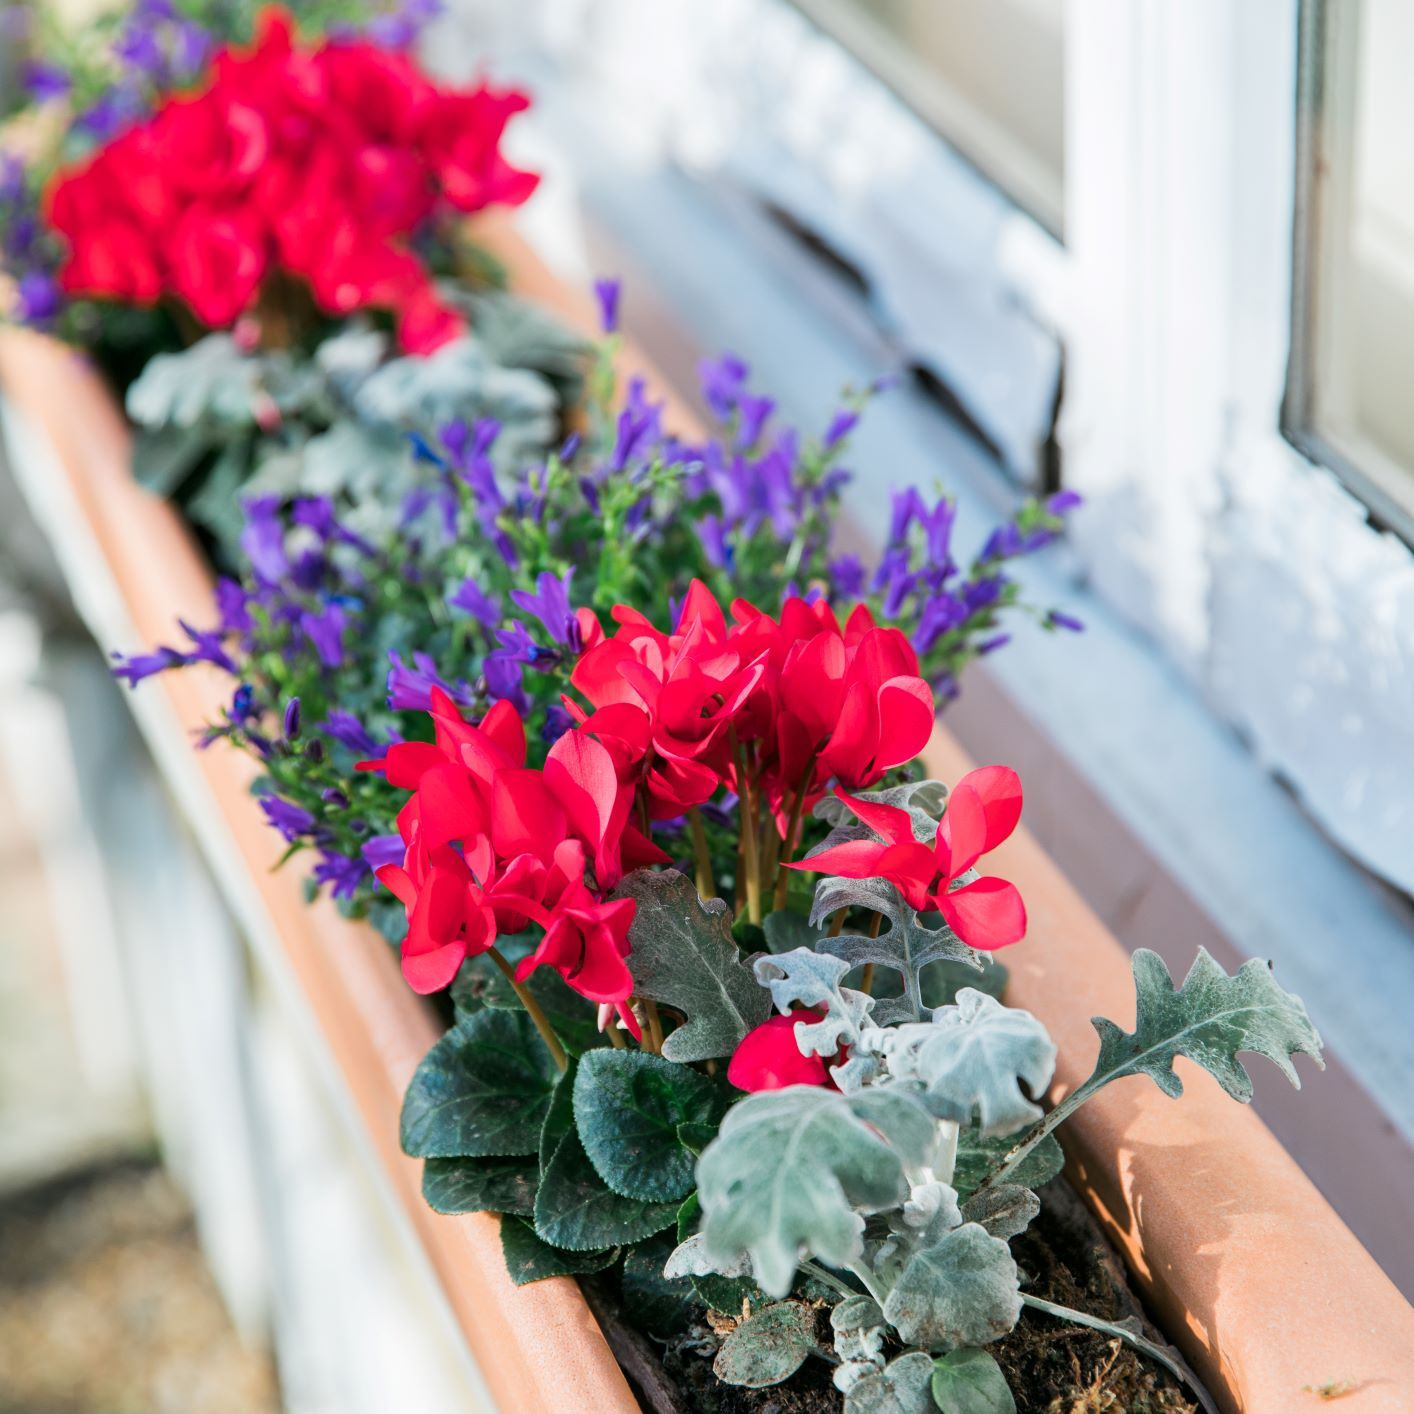 A Window Fleur product